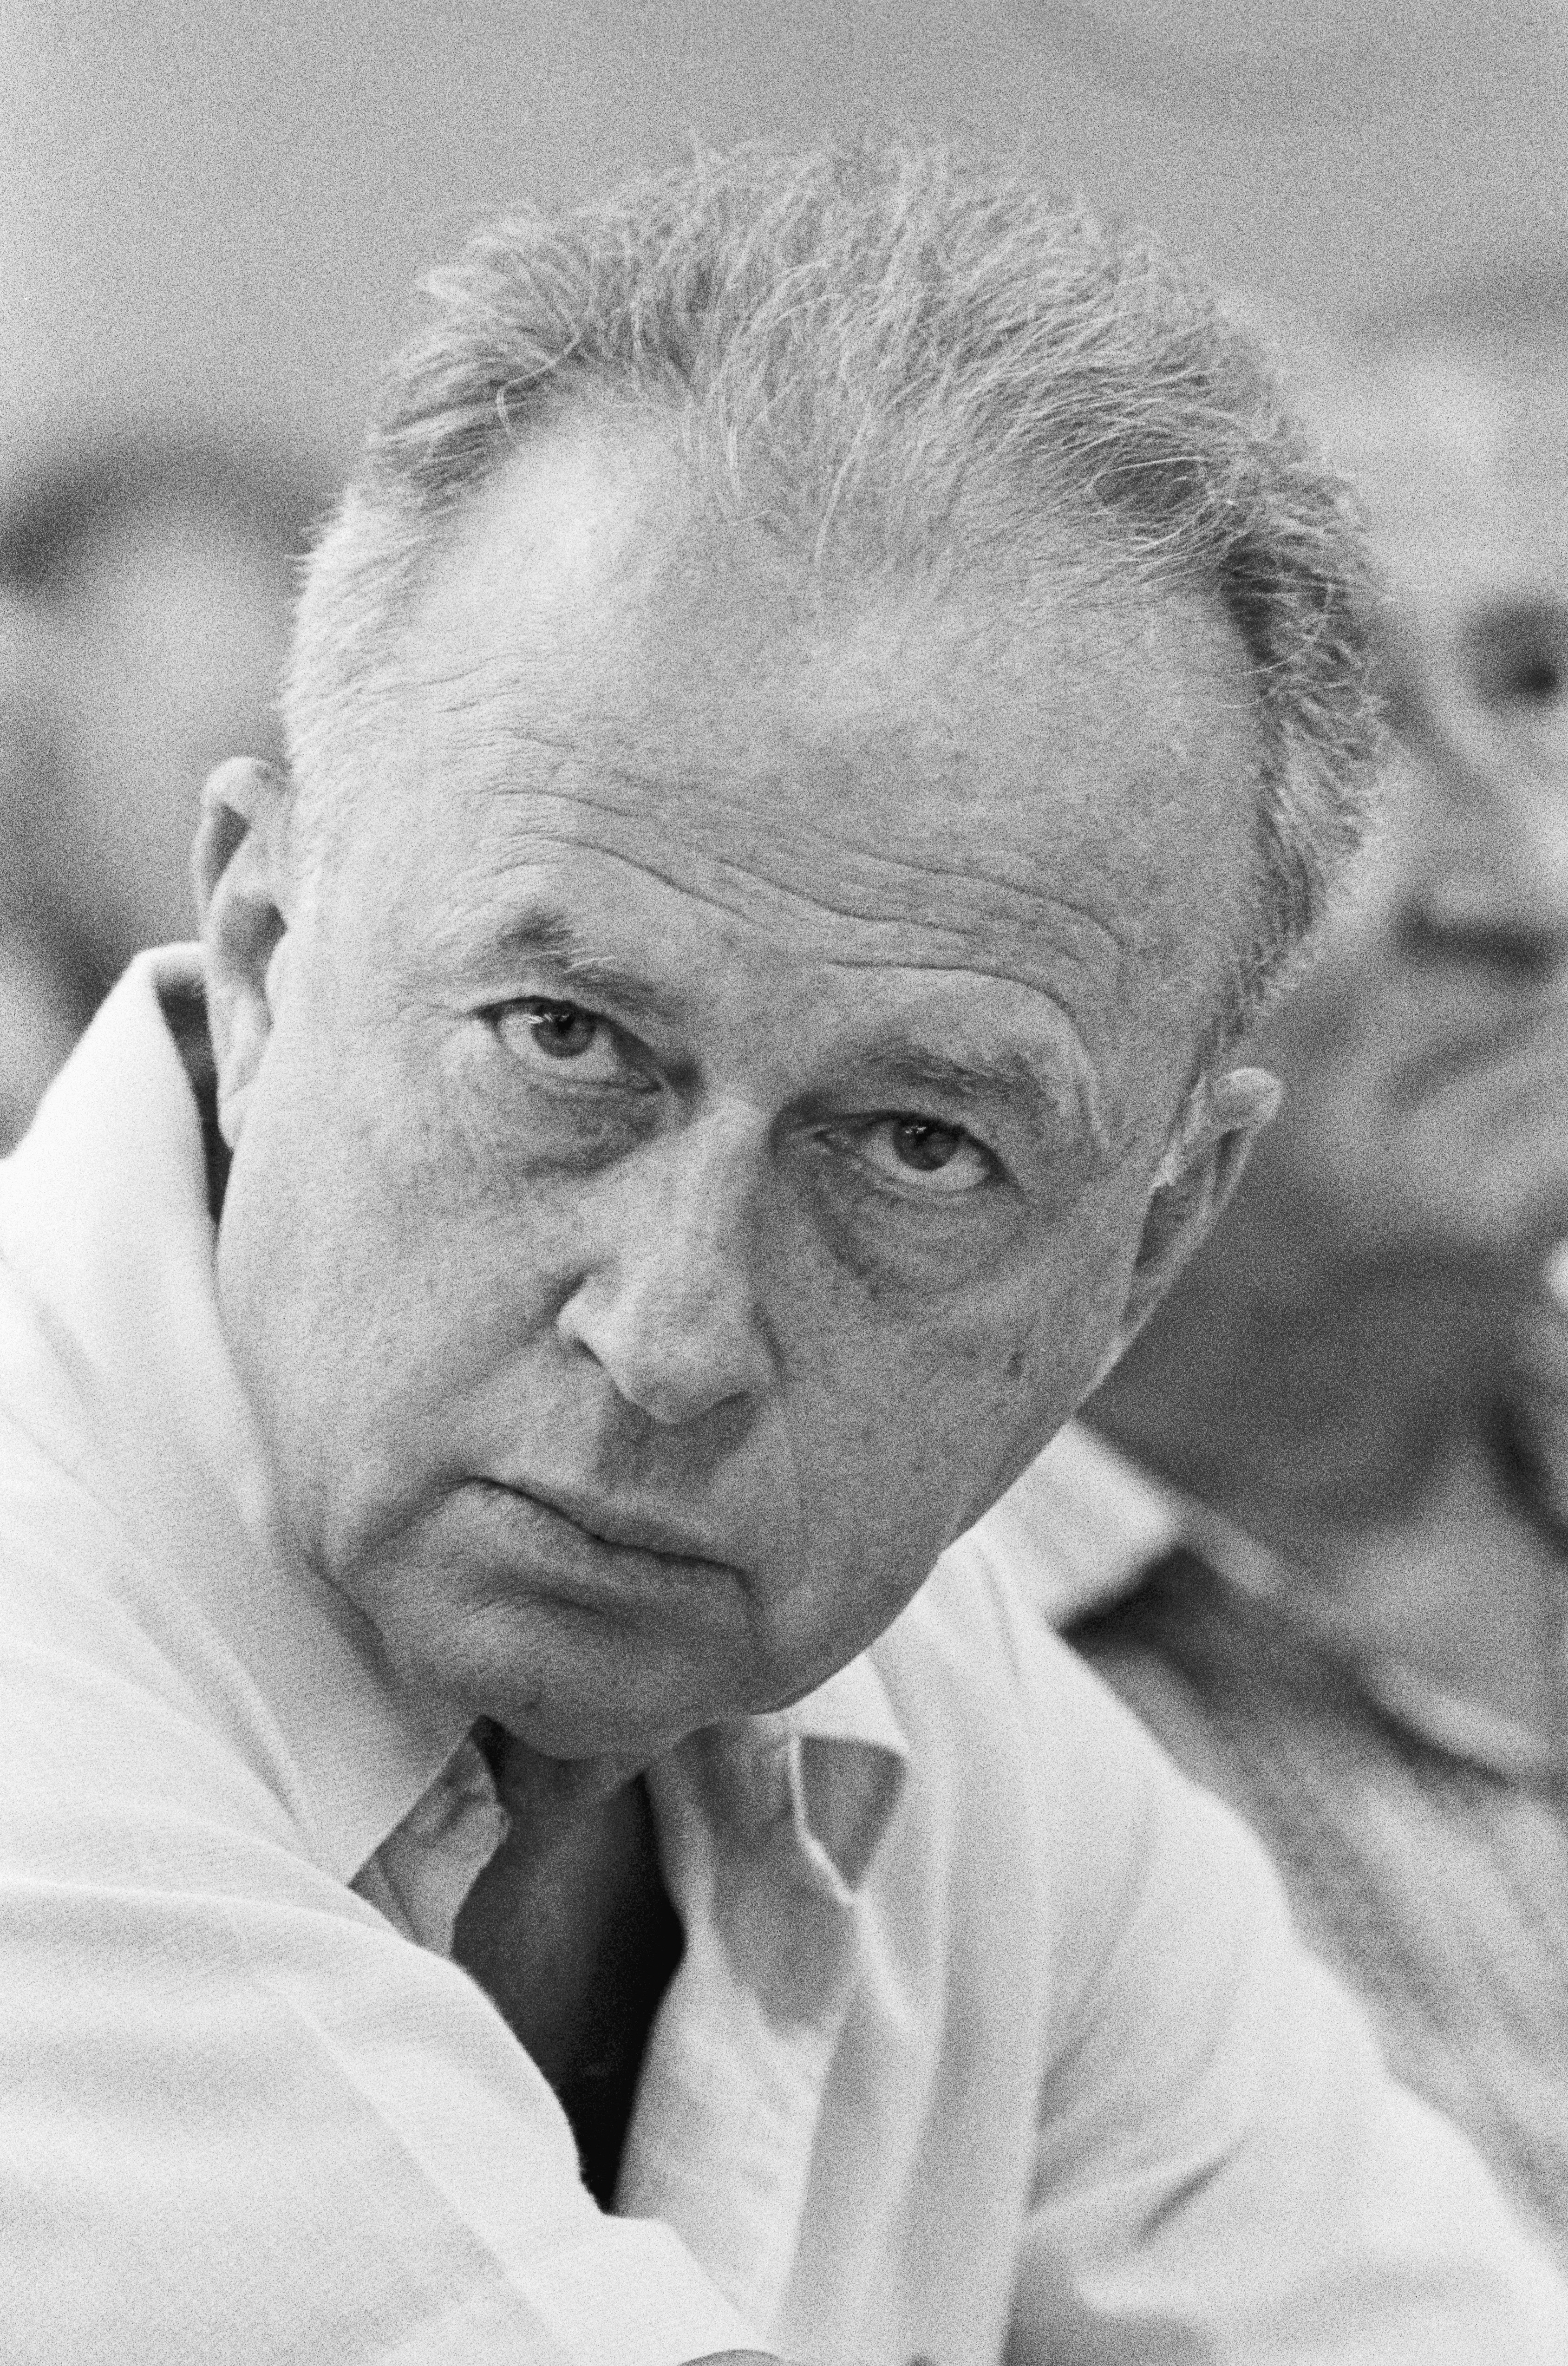 yitzhak rabin film